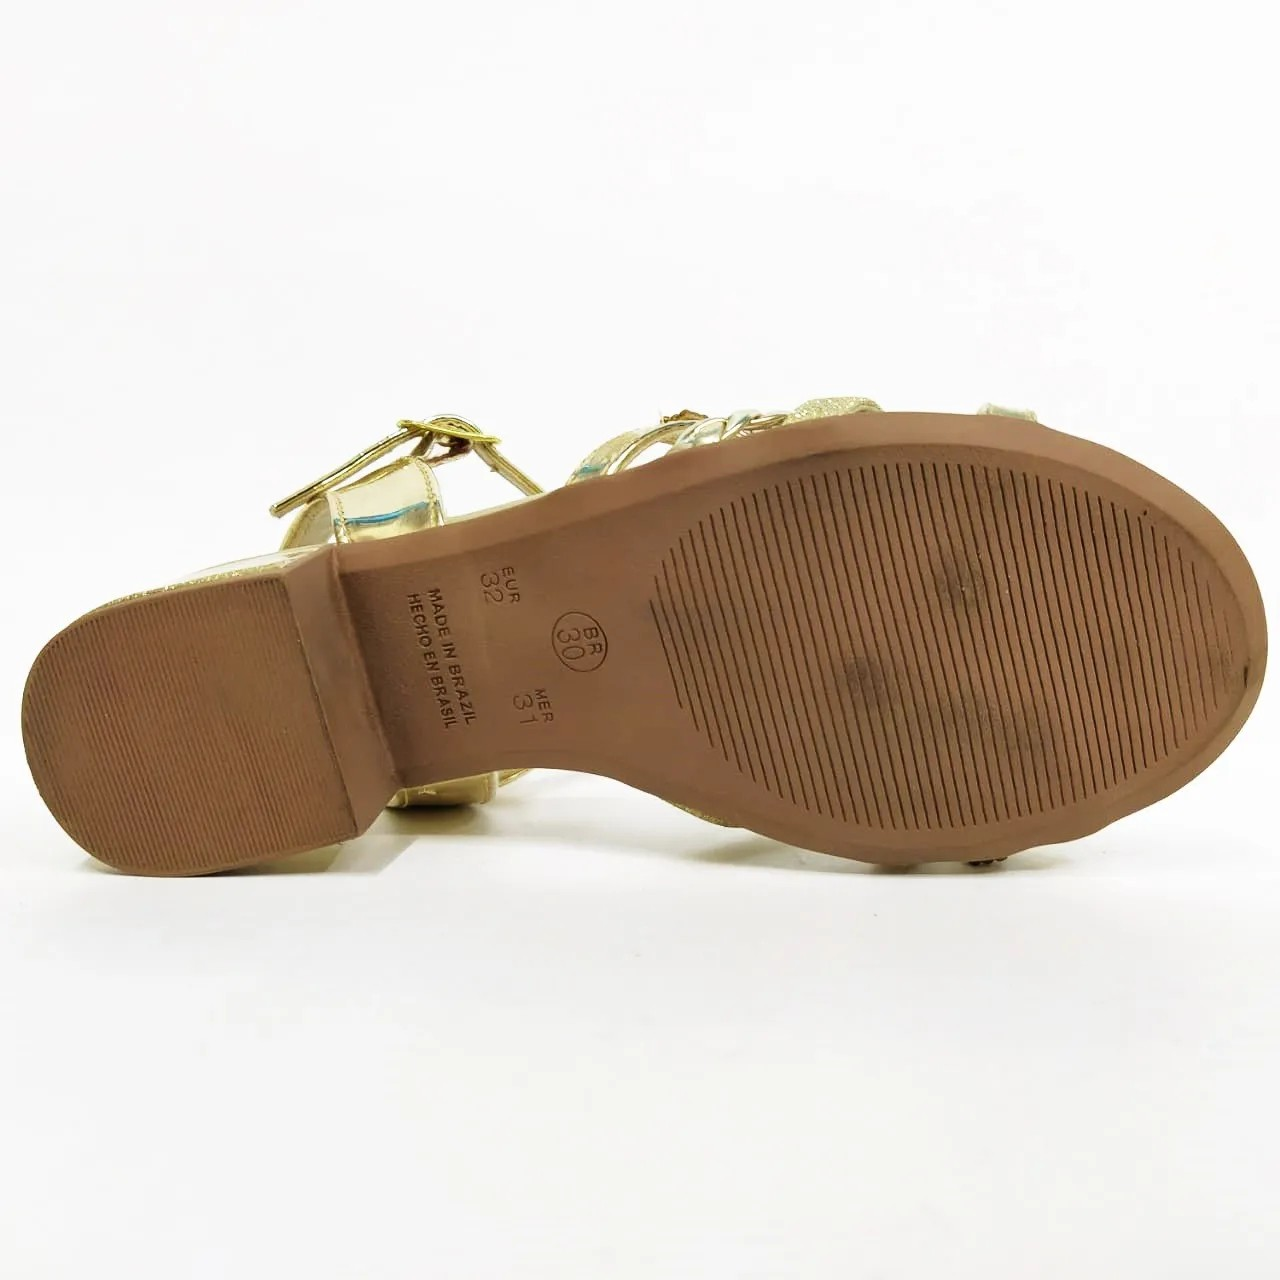 Sandália infantil feminina Klassipe 172.182.466 - Dourado